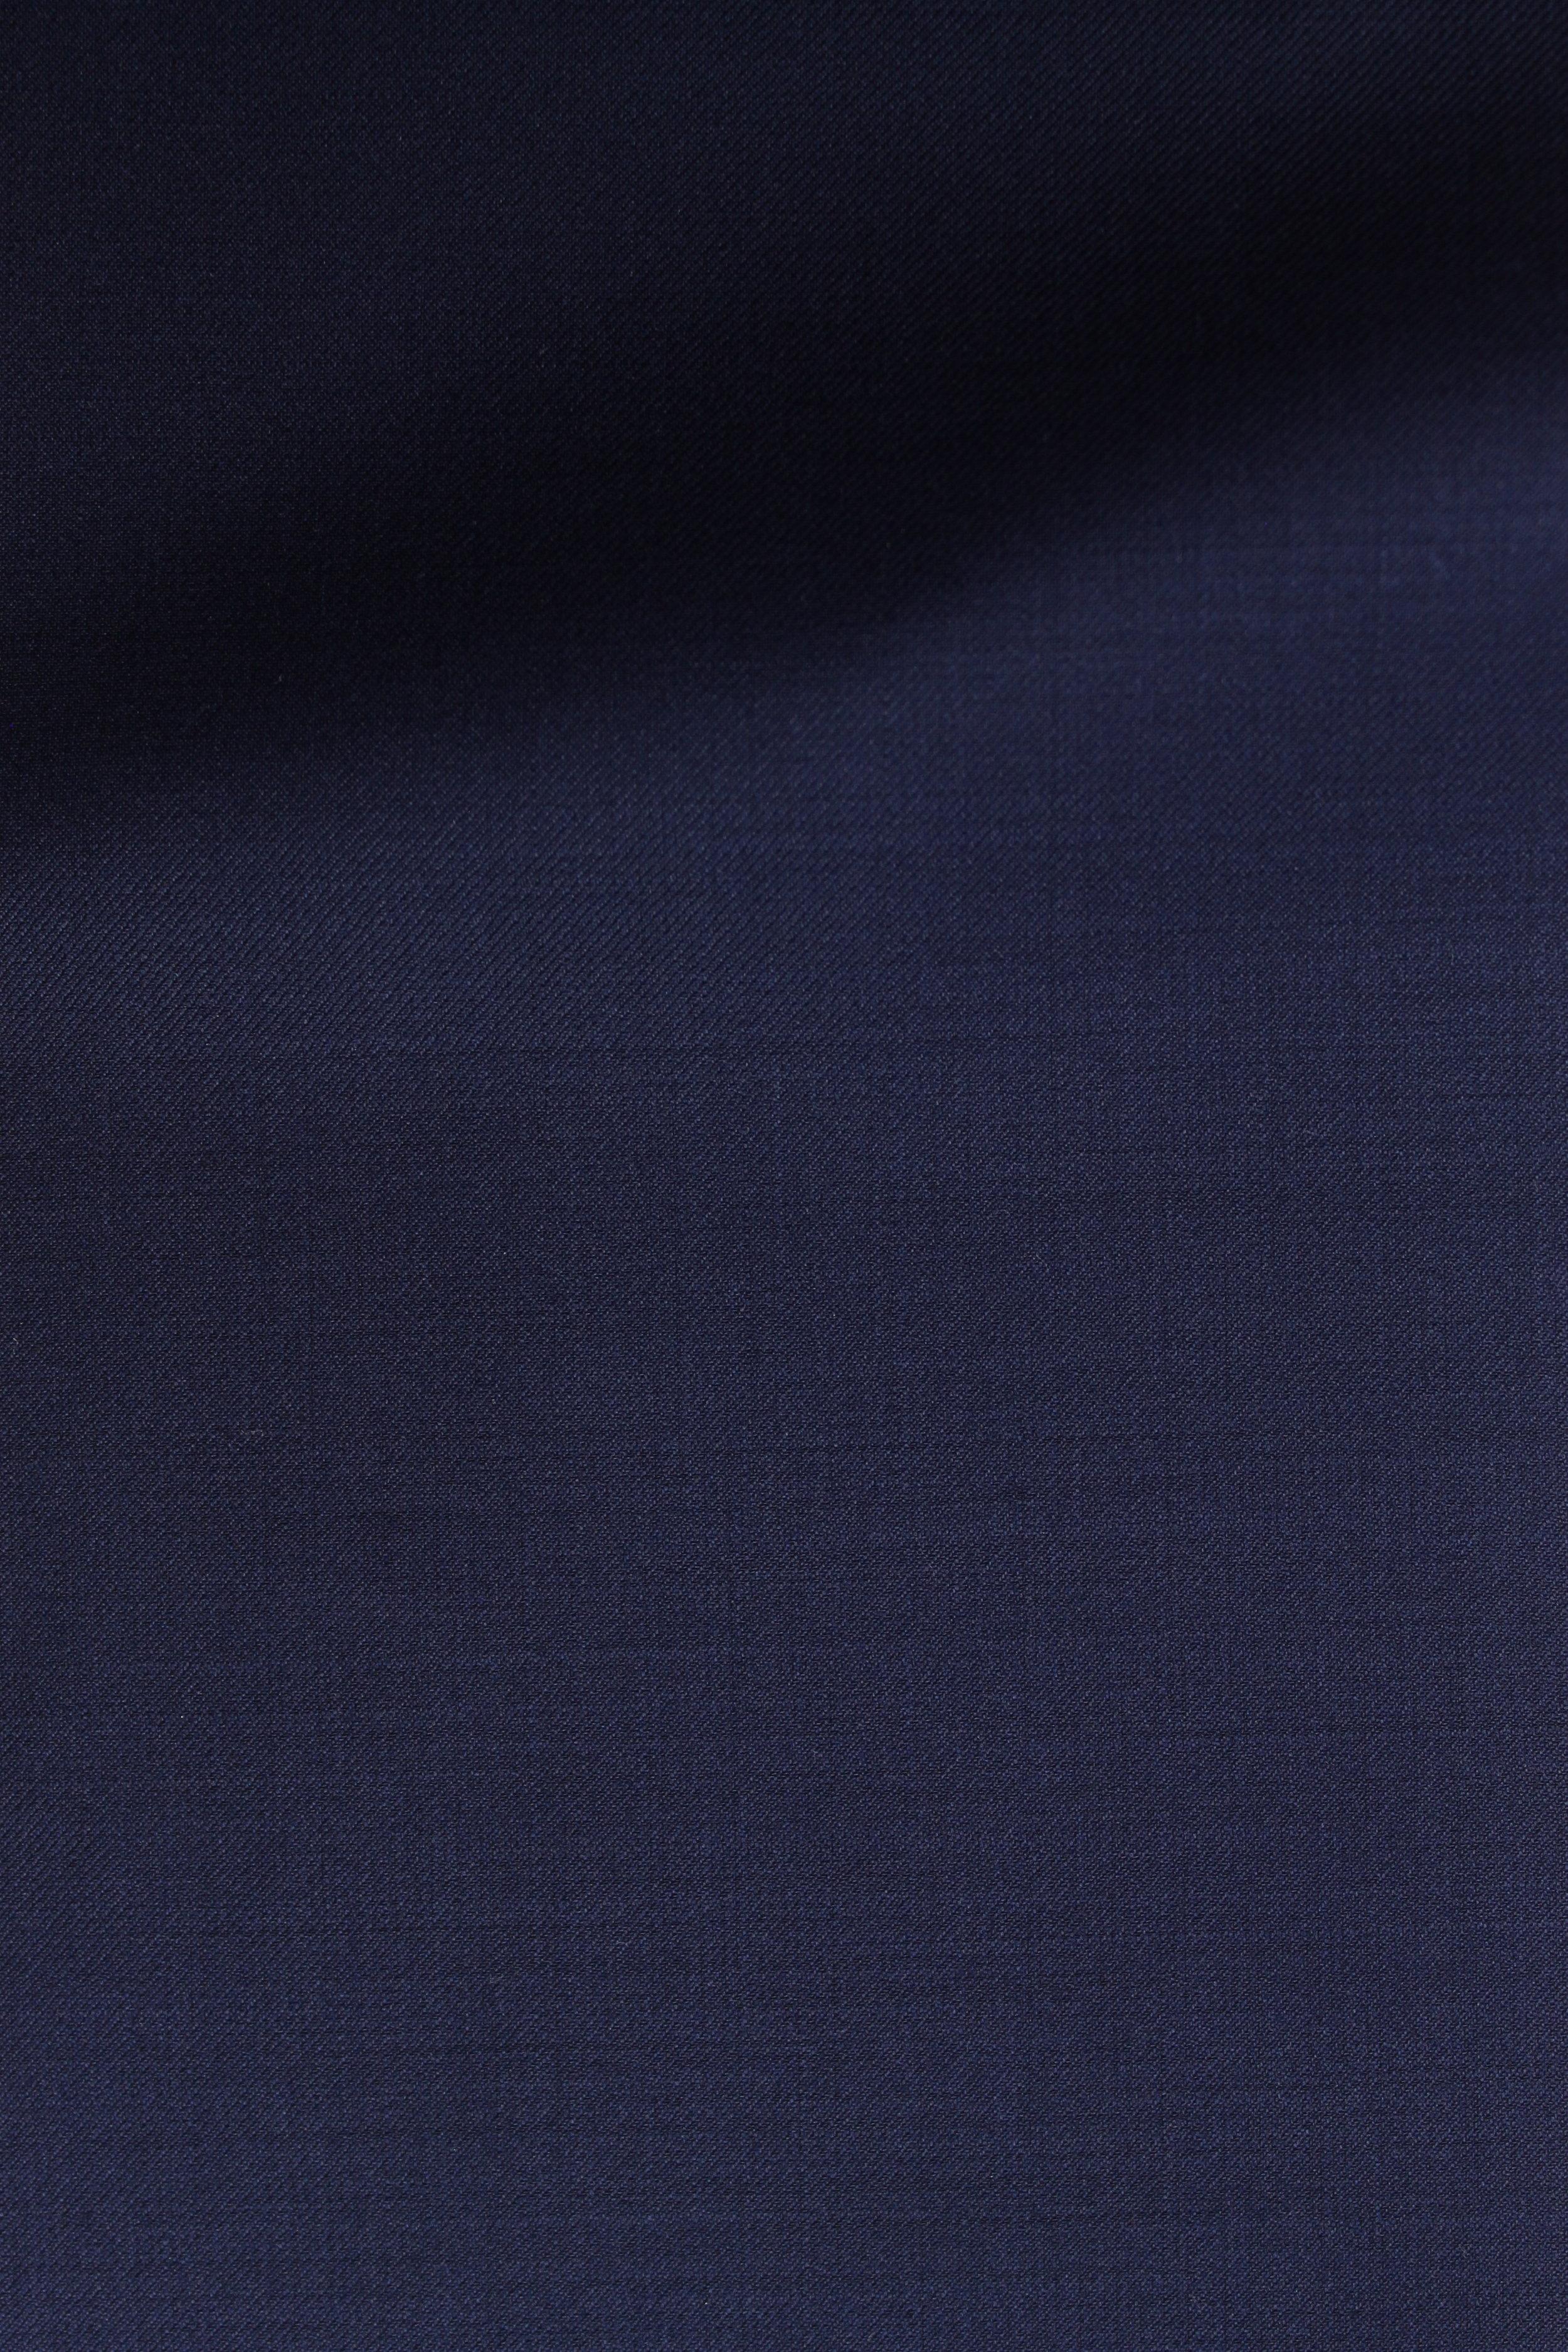 7668 Blue Navy 260g.JPG